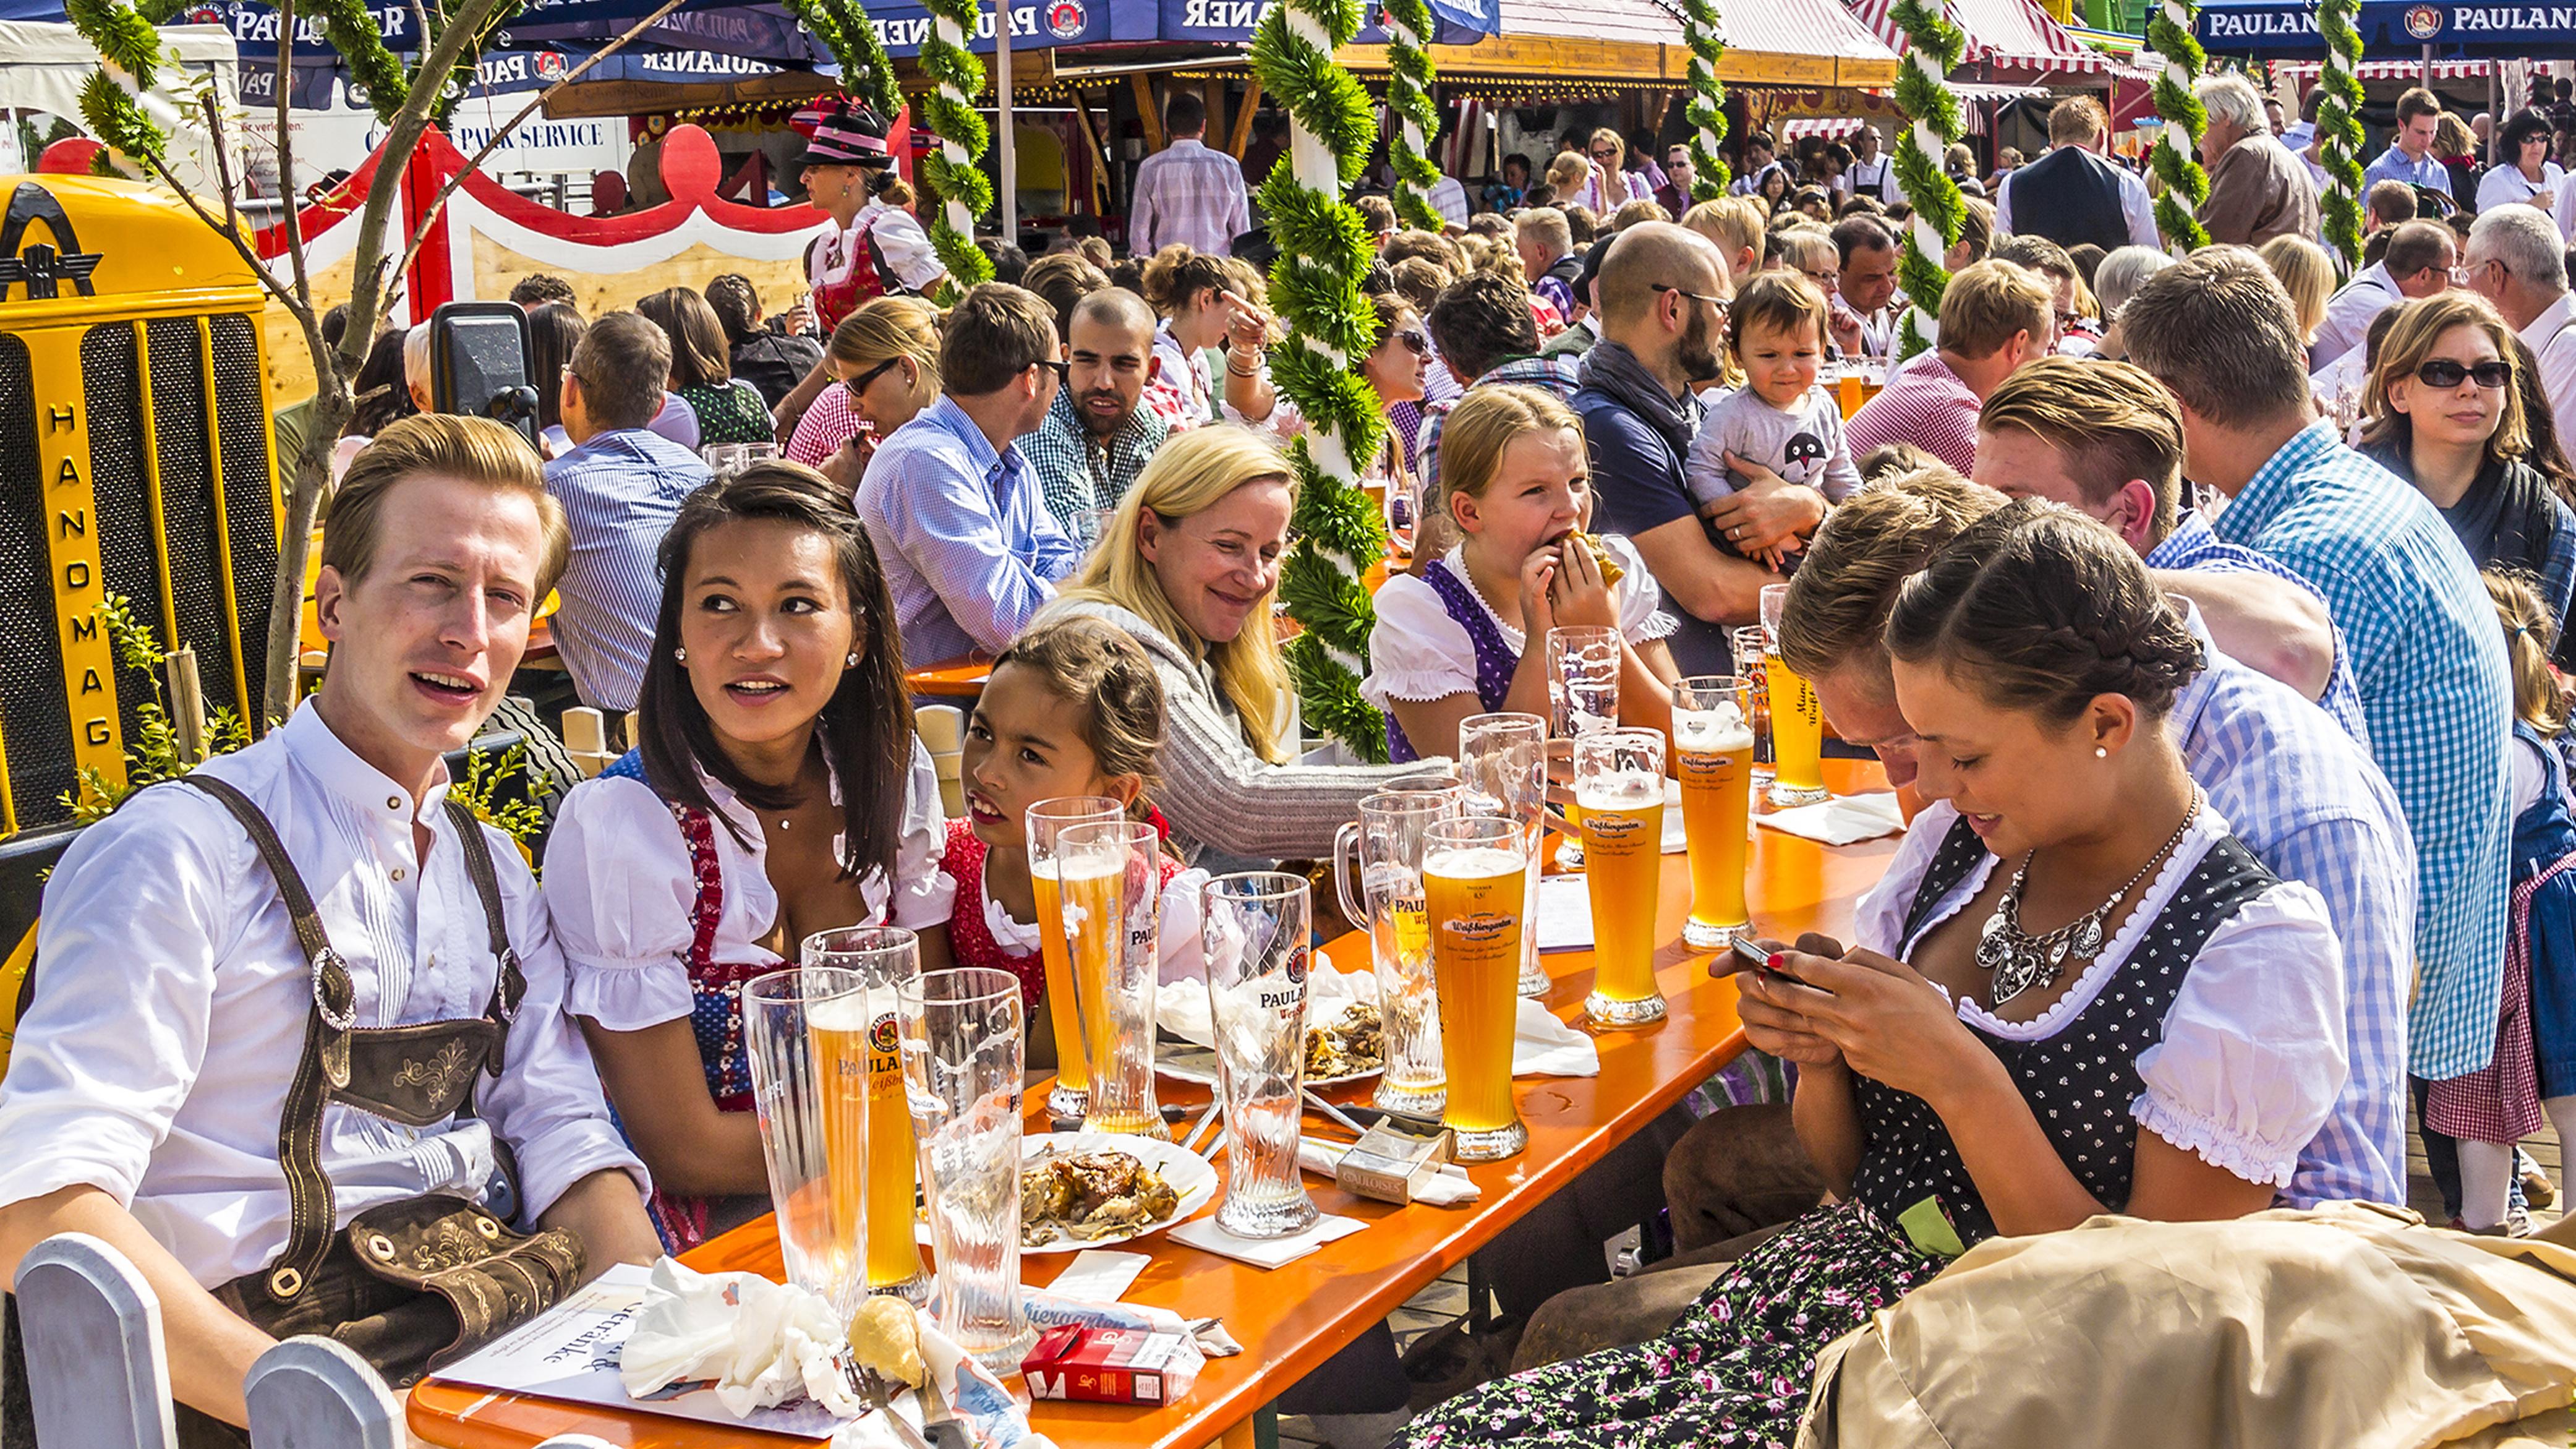 Germany OktoberFest HD Wallpapers 2017 4166x2343